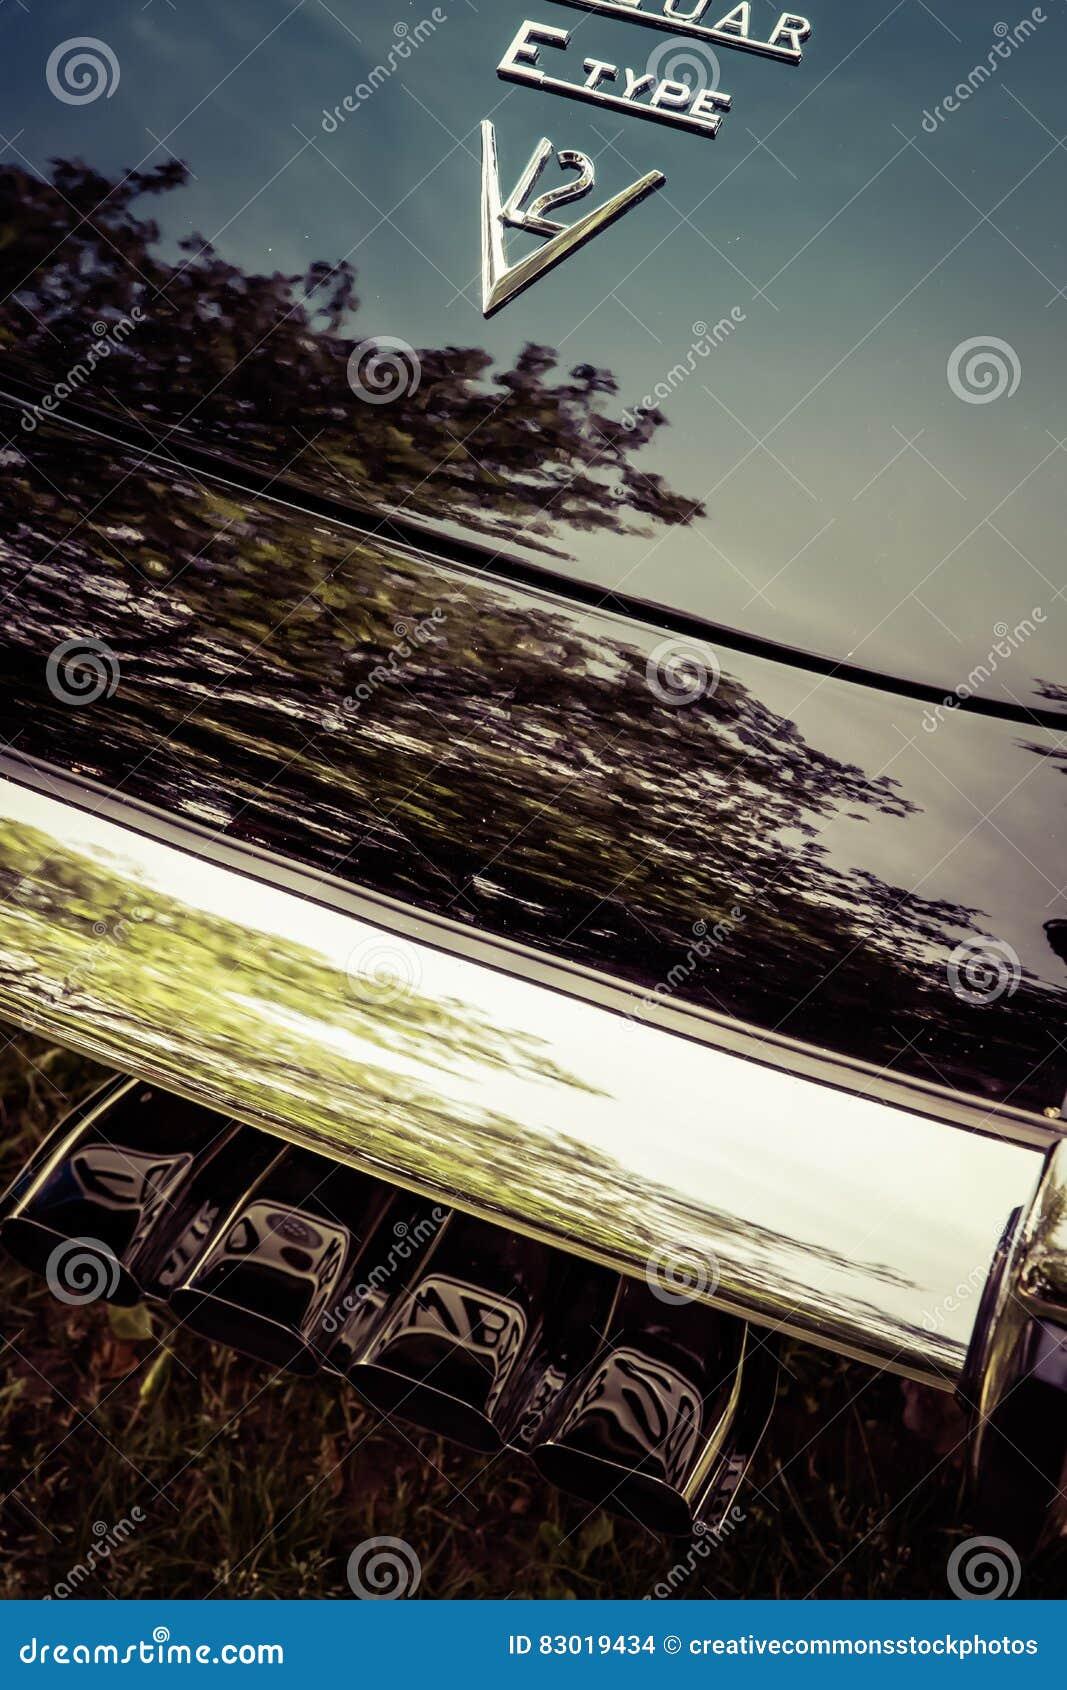 Download Old fashioned jaguar v12 stock photo. Image of fashionable - 83019434